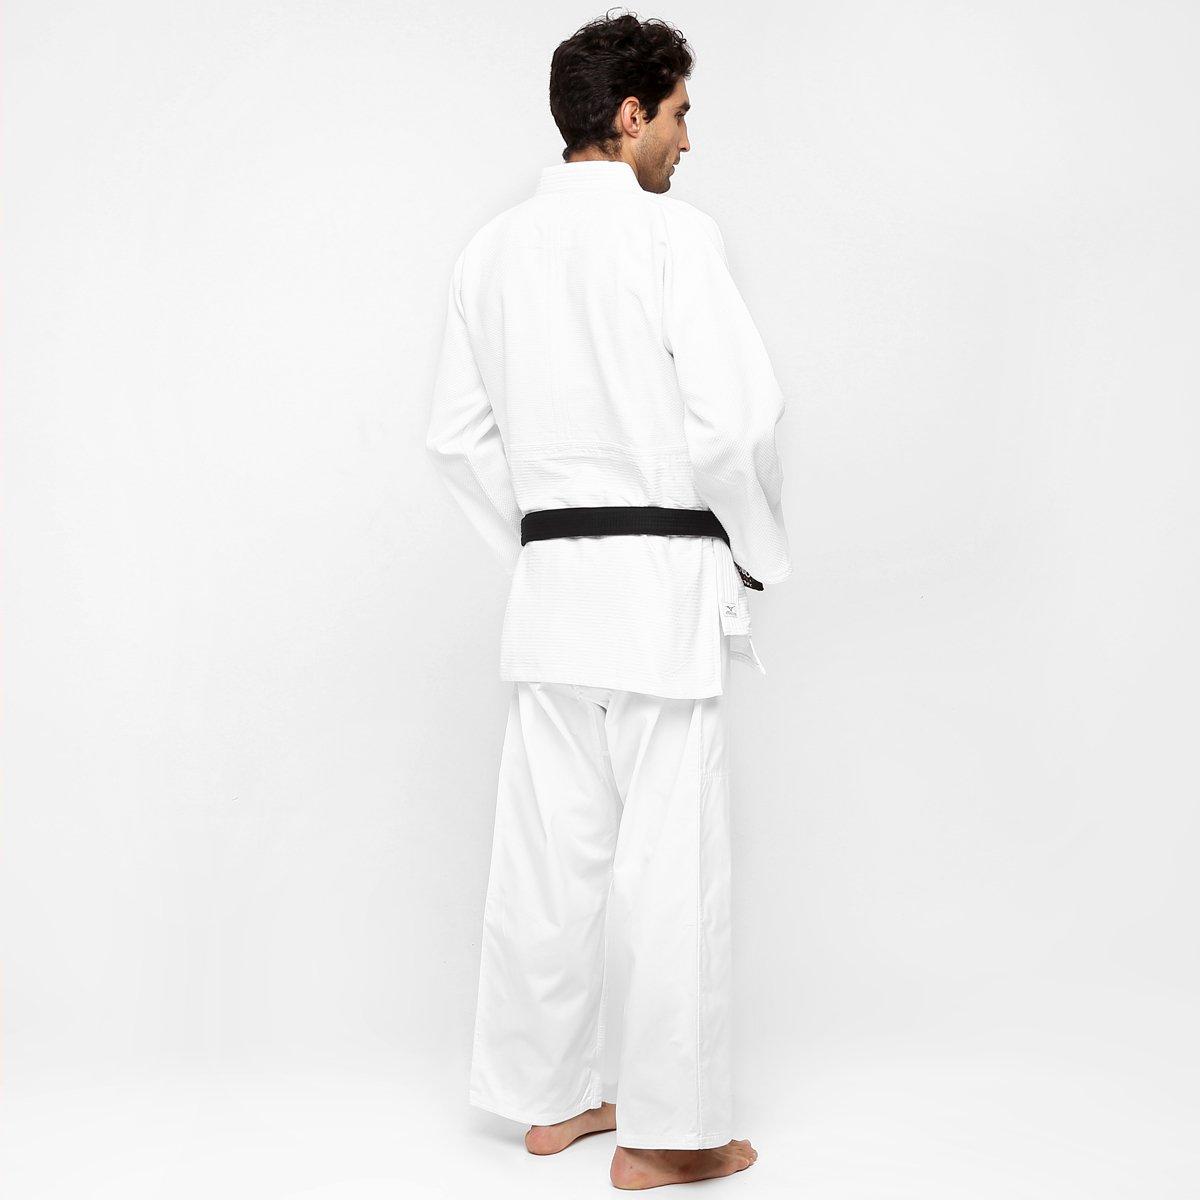 c506b11070b Kimono Judô Mizuno Hayato - Compre Agora